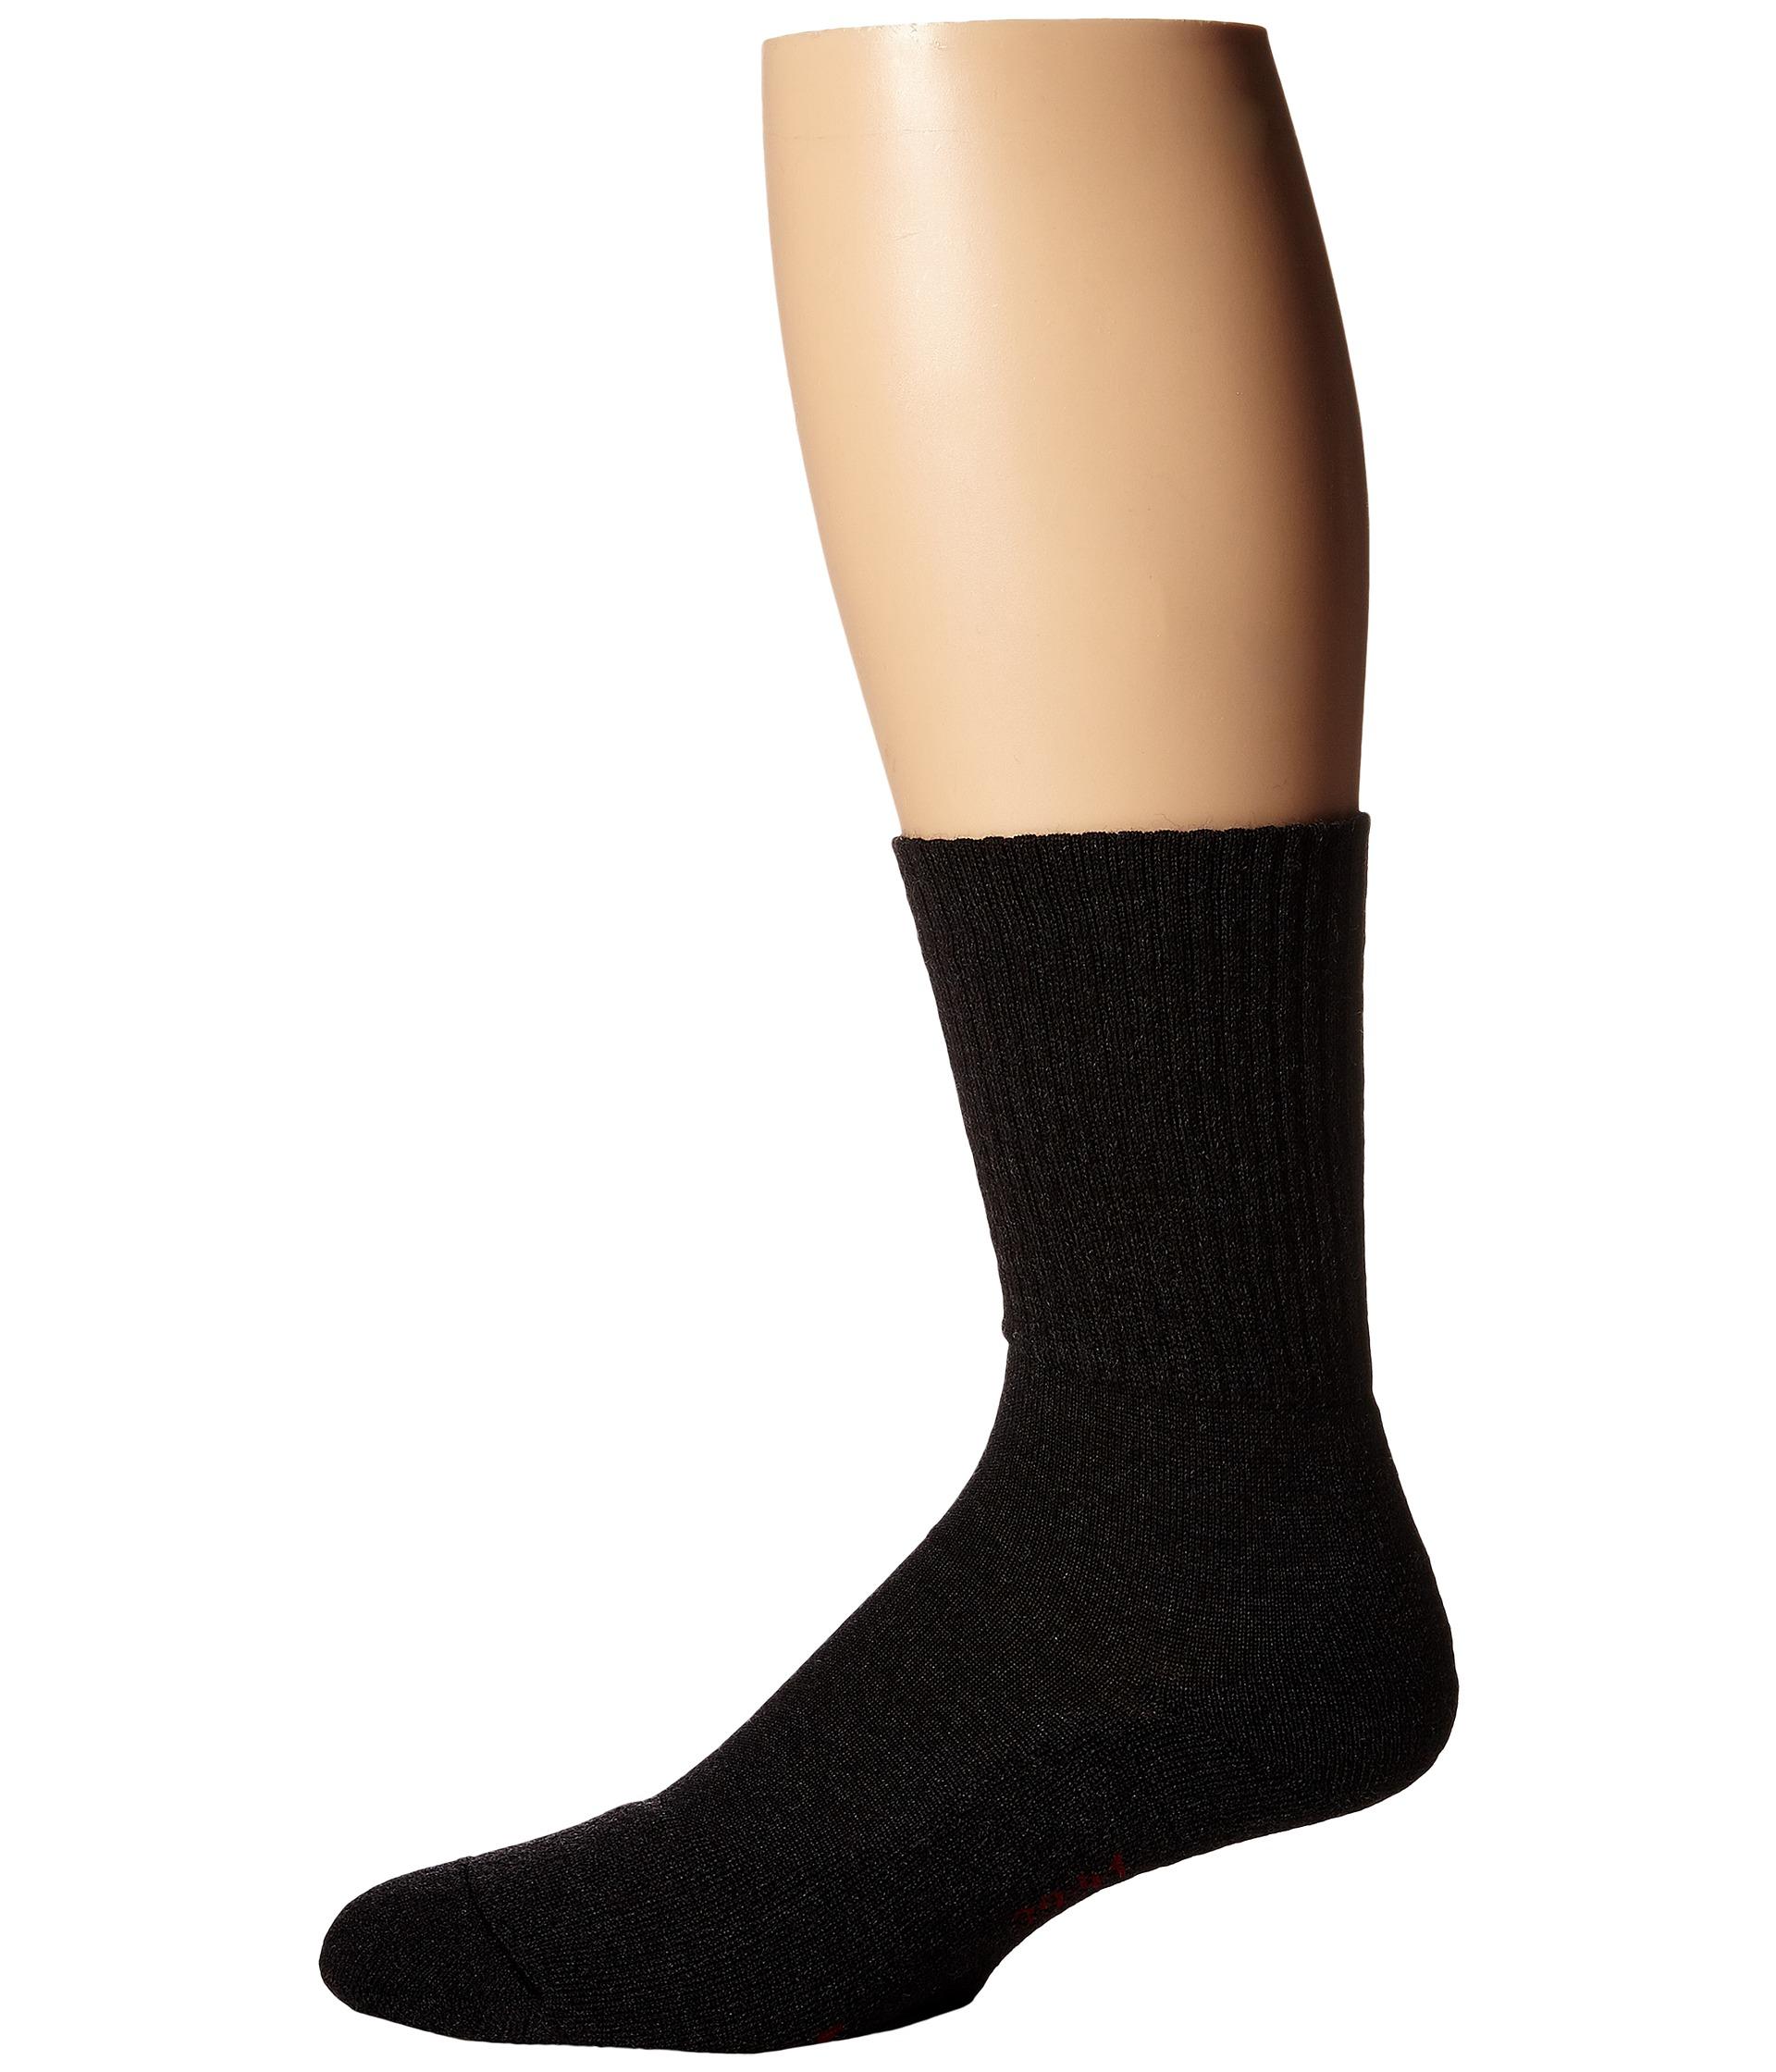 falke walkie light socks in gray for men lyst. Black Bedroom Furniture Sets. Home Design Ideas